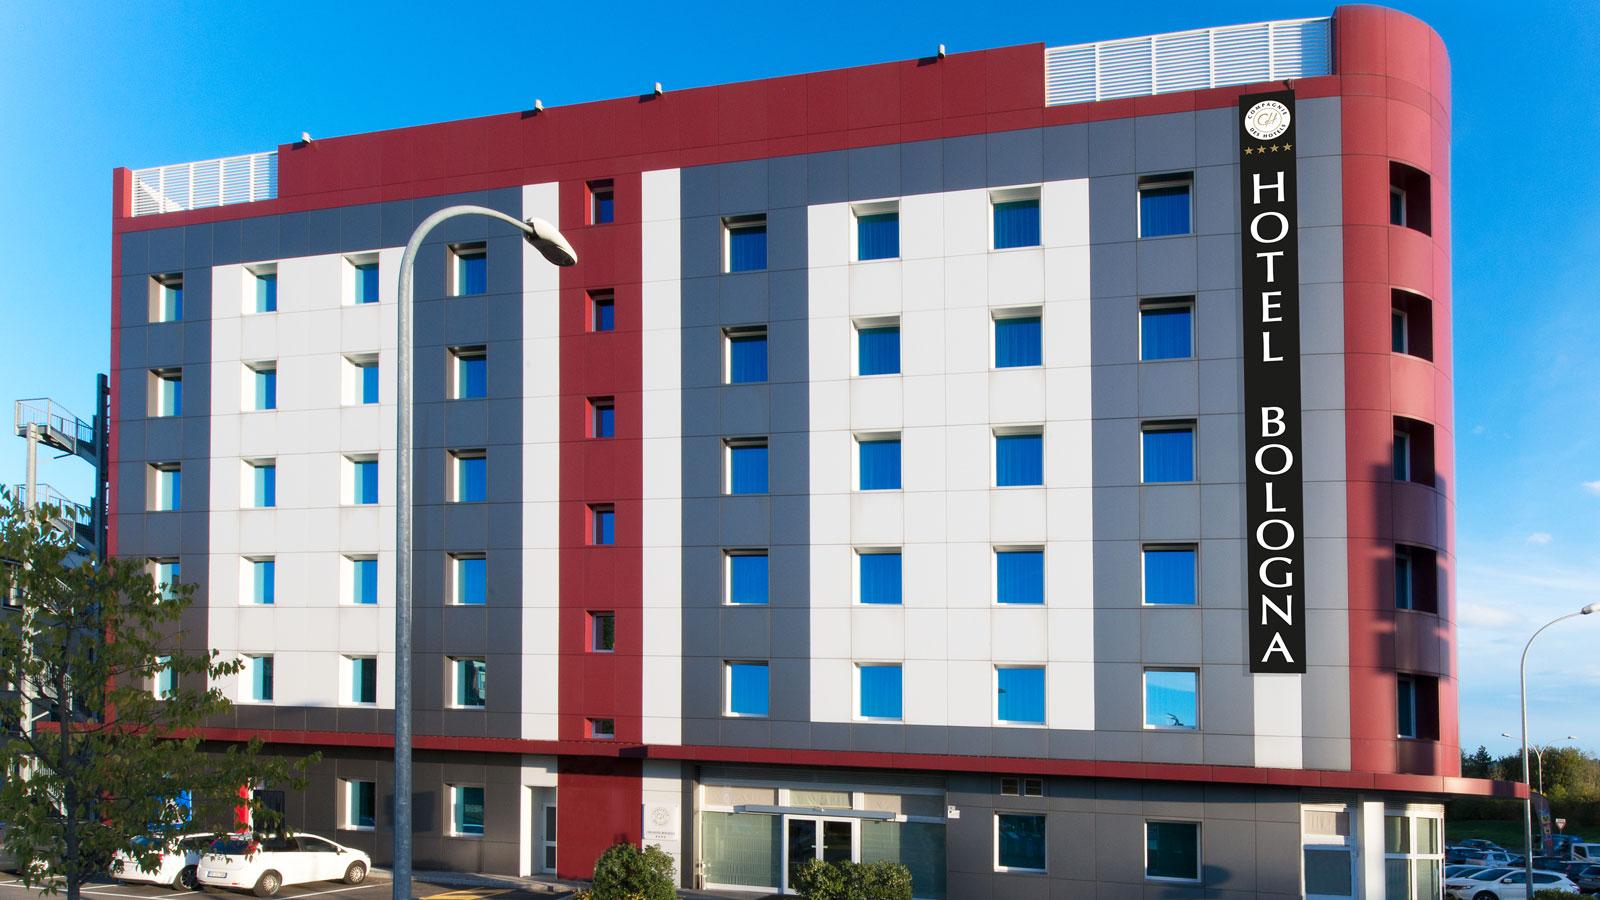 prenota cdh hotel bologna albergo 4 stelle a borgo panigale